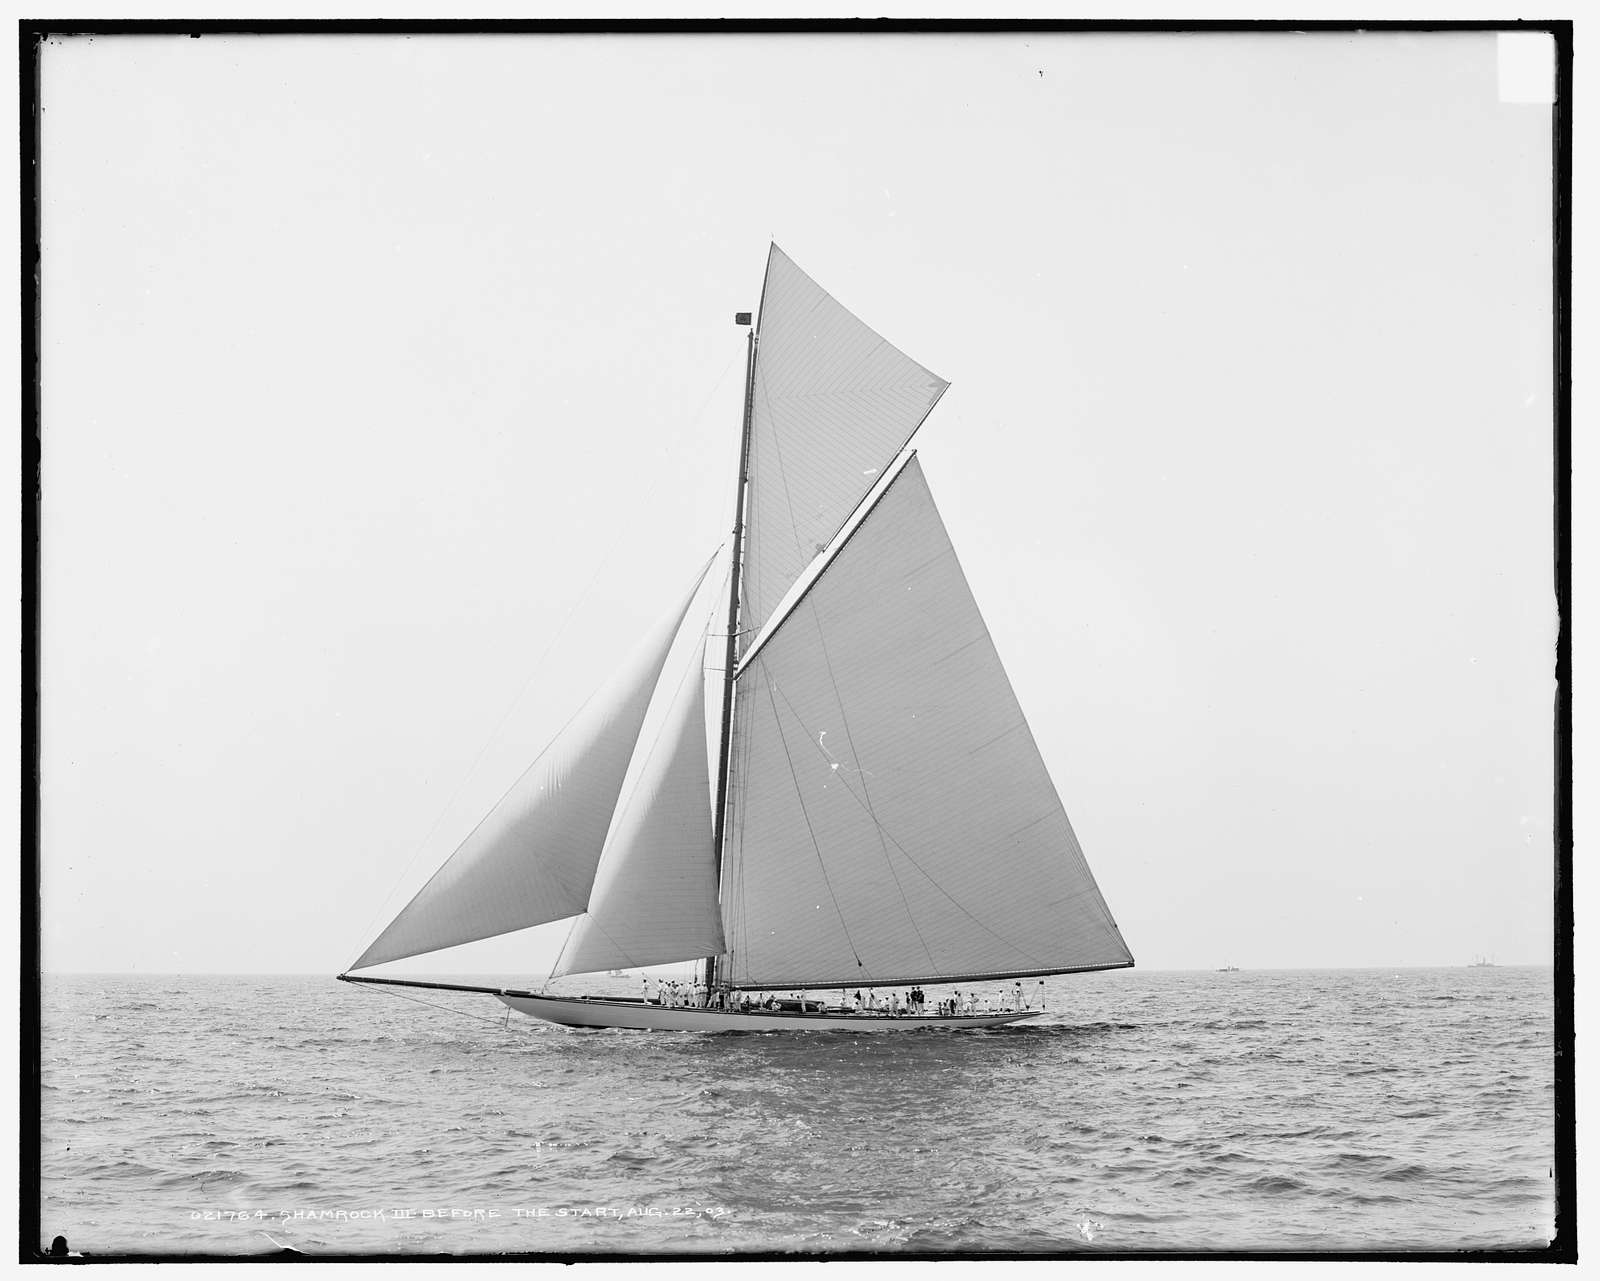 Shamrock III before the start, Aug. 22, 1903